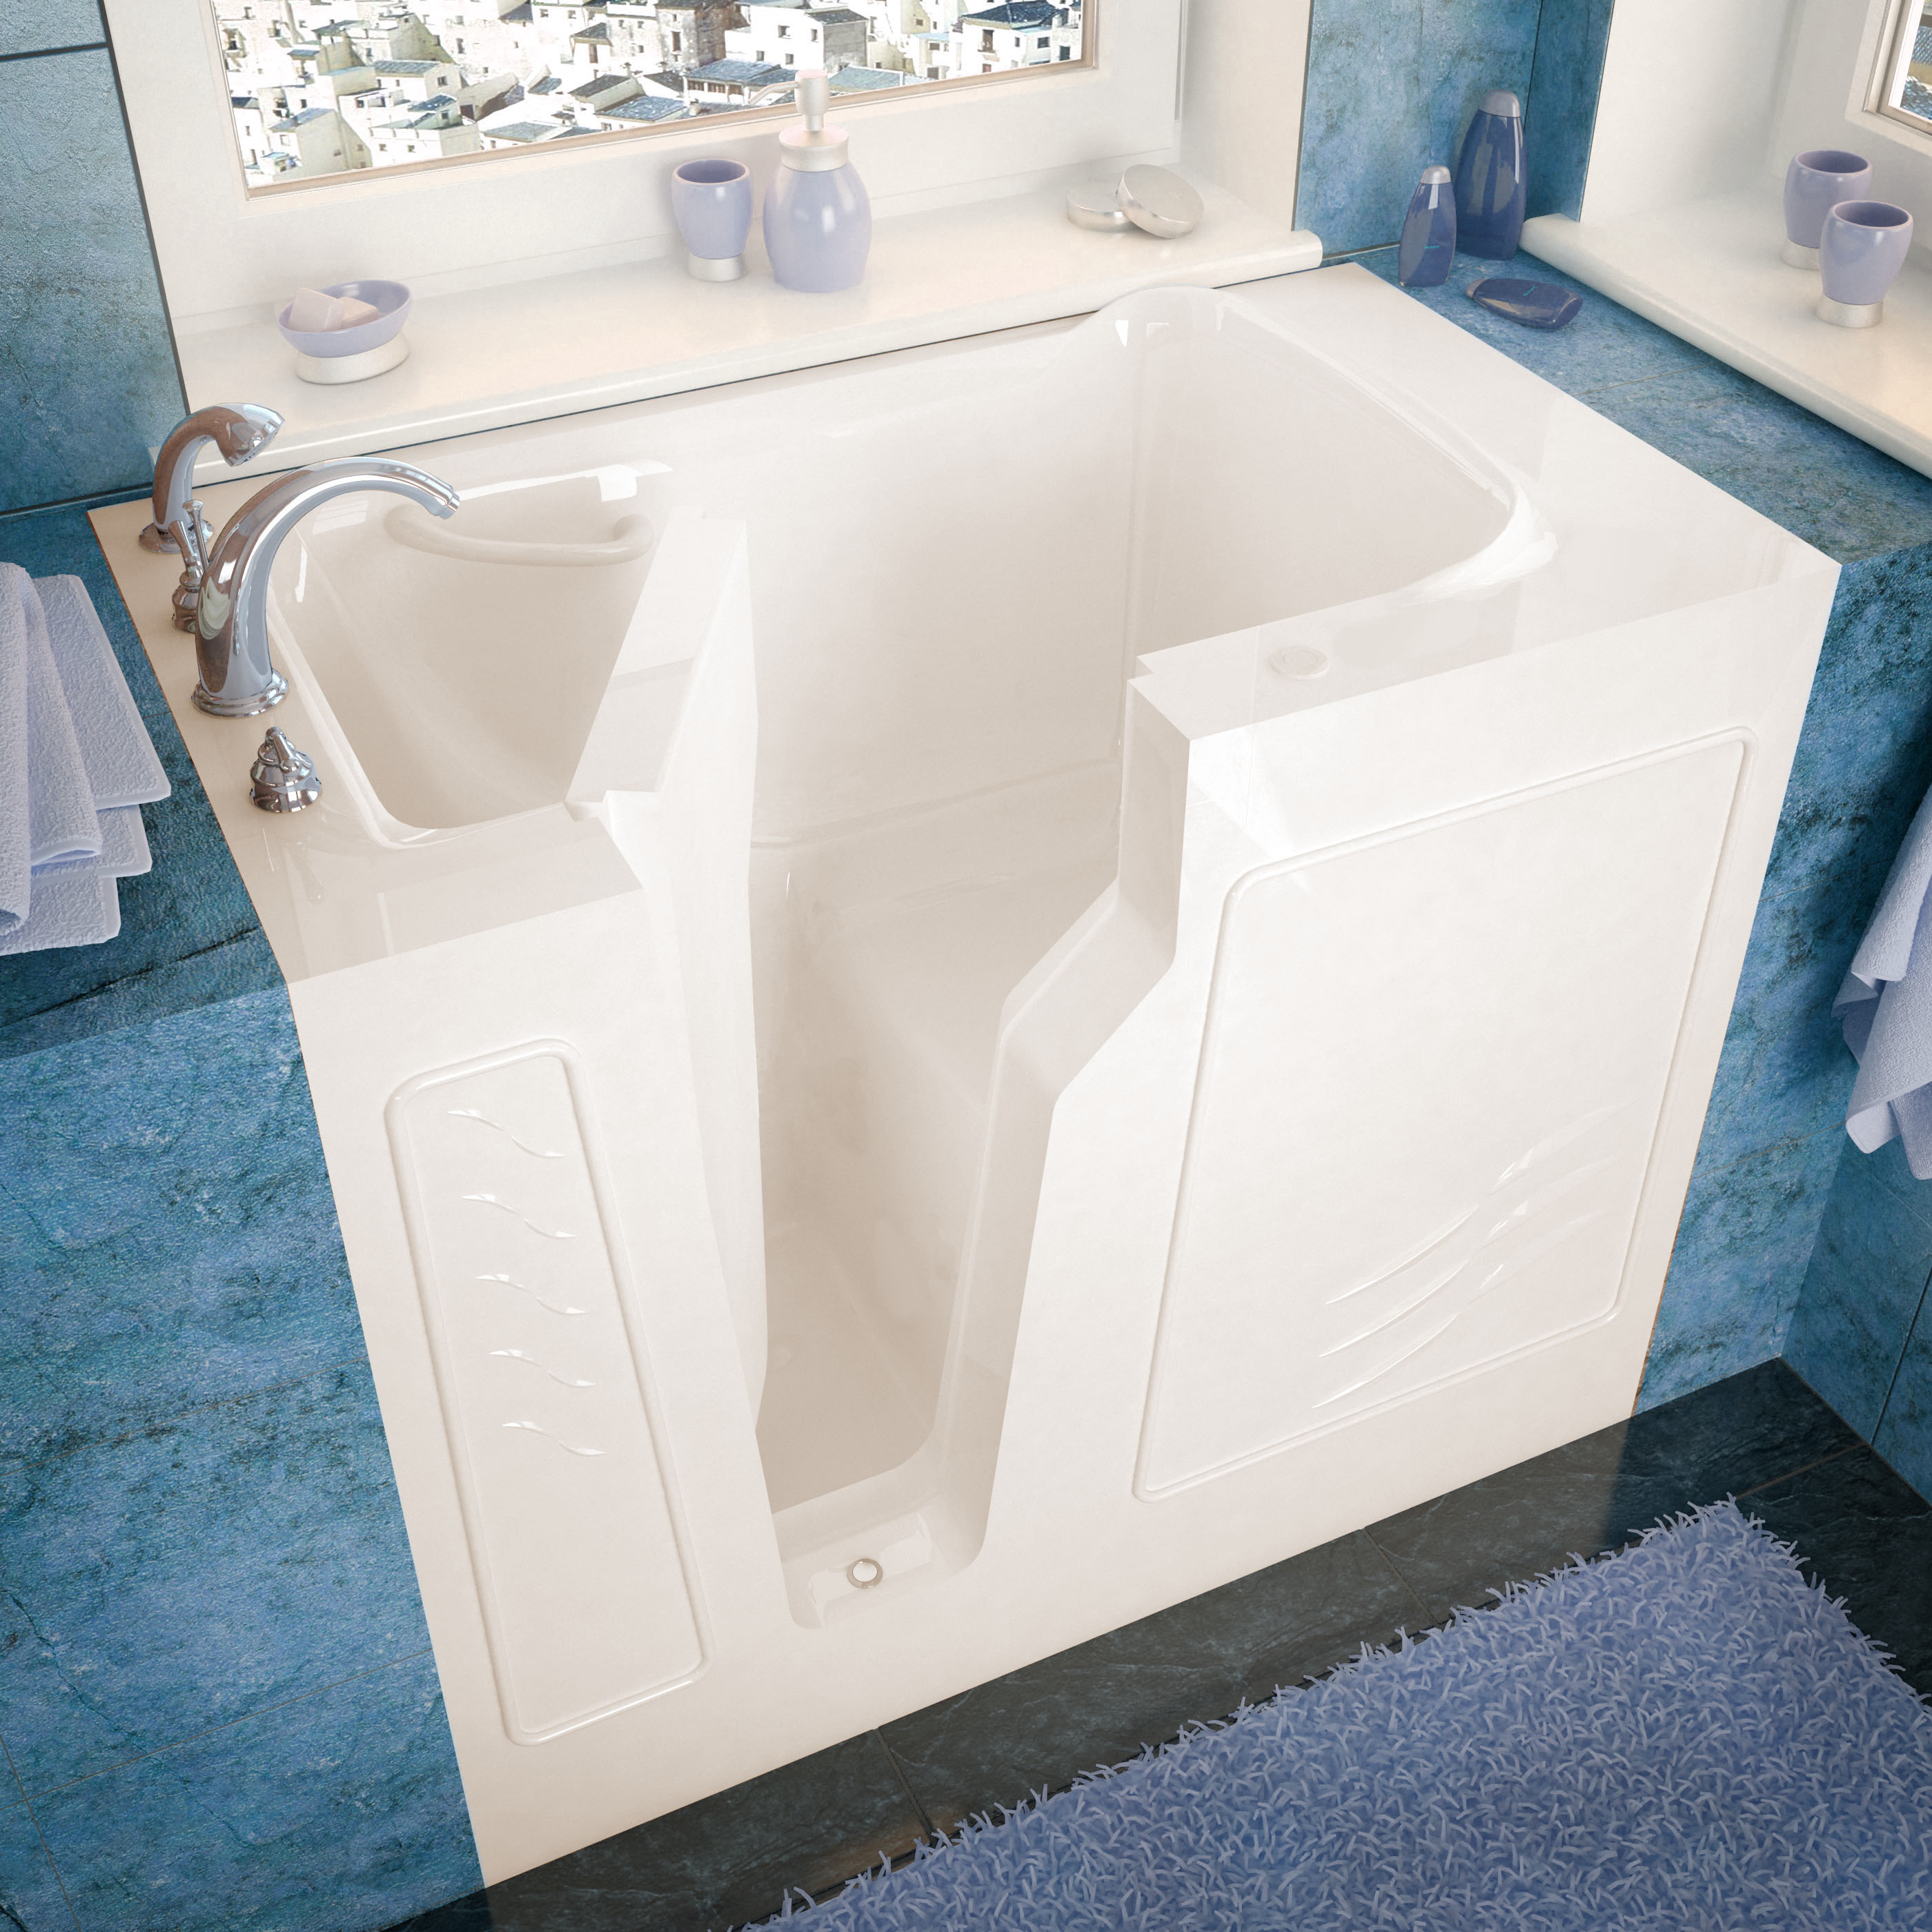 26x46 Left Drain Biscuit Soaking Walk-In Bathtub